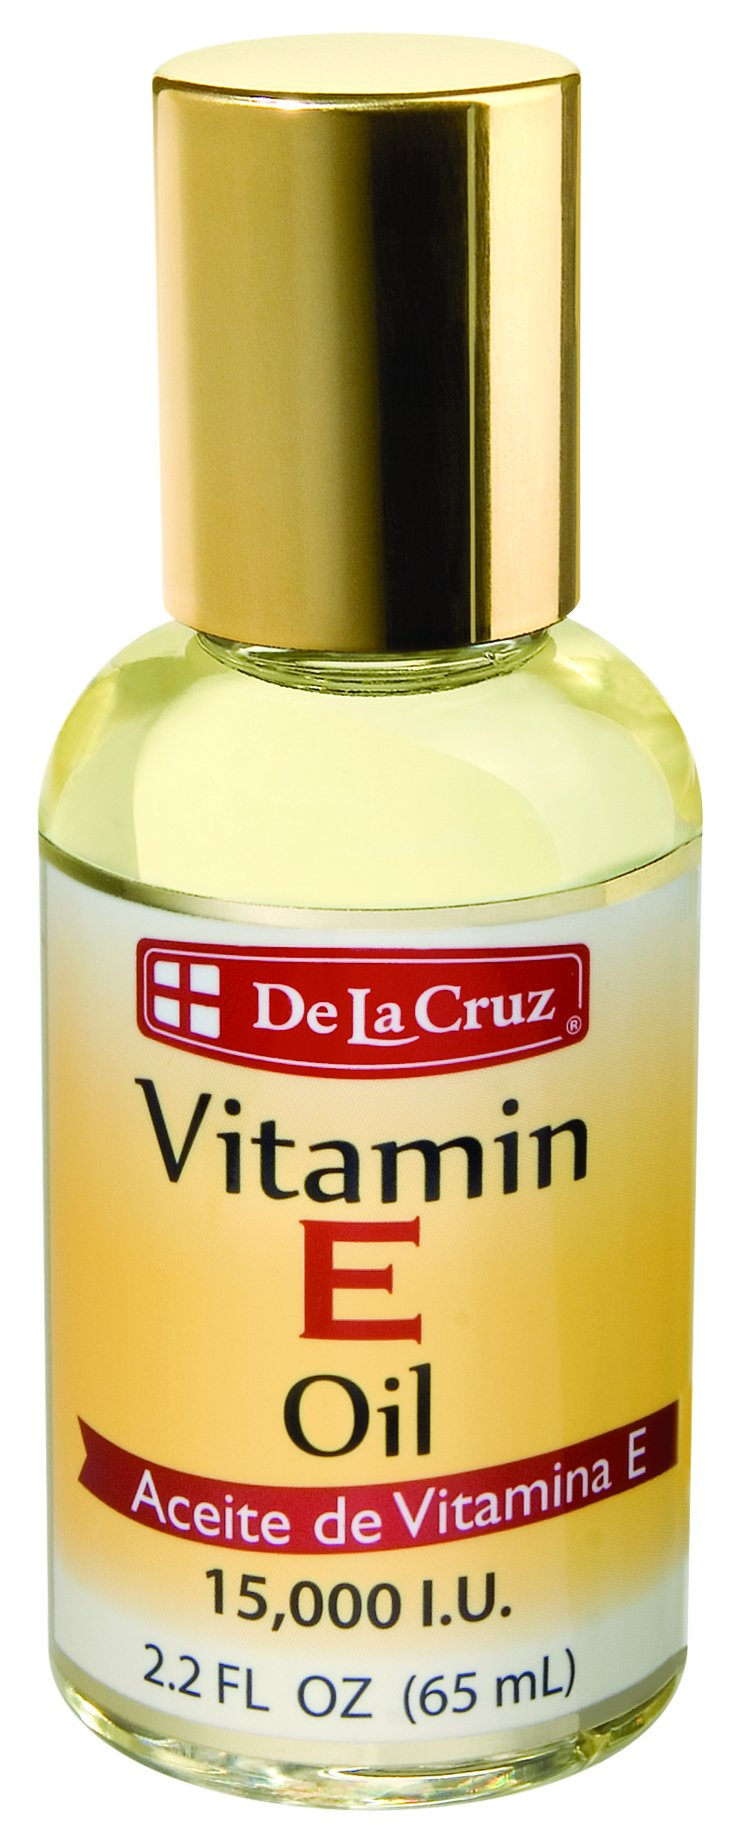 De La Cruz Vitamin E Oil 15,000 IU, No Preservatives, Artificial Colors or Fragrances, Made in USA 2.2 FL. OZ. (10 Bottles)